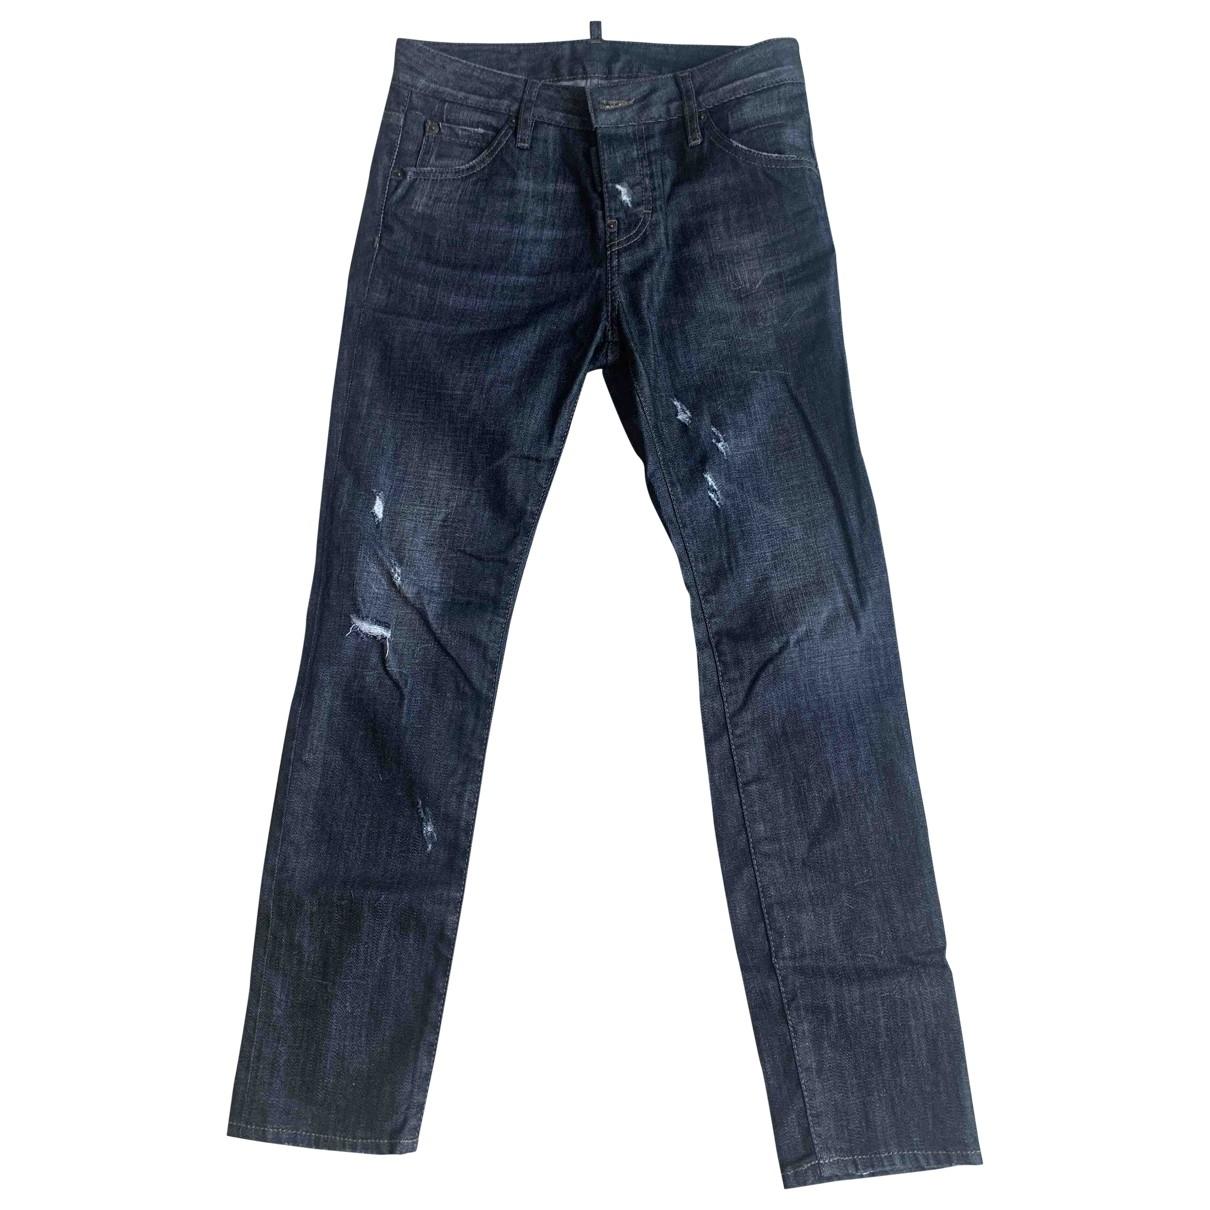 Dsquared2 \N Black Cotton - elasthane Jeans for Women 36 FR